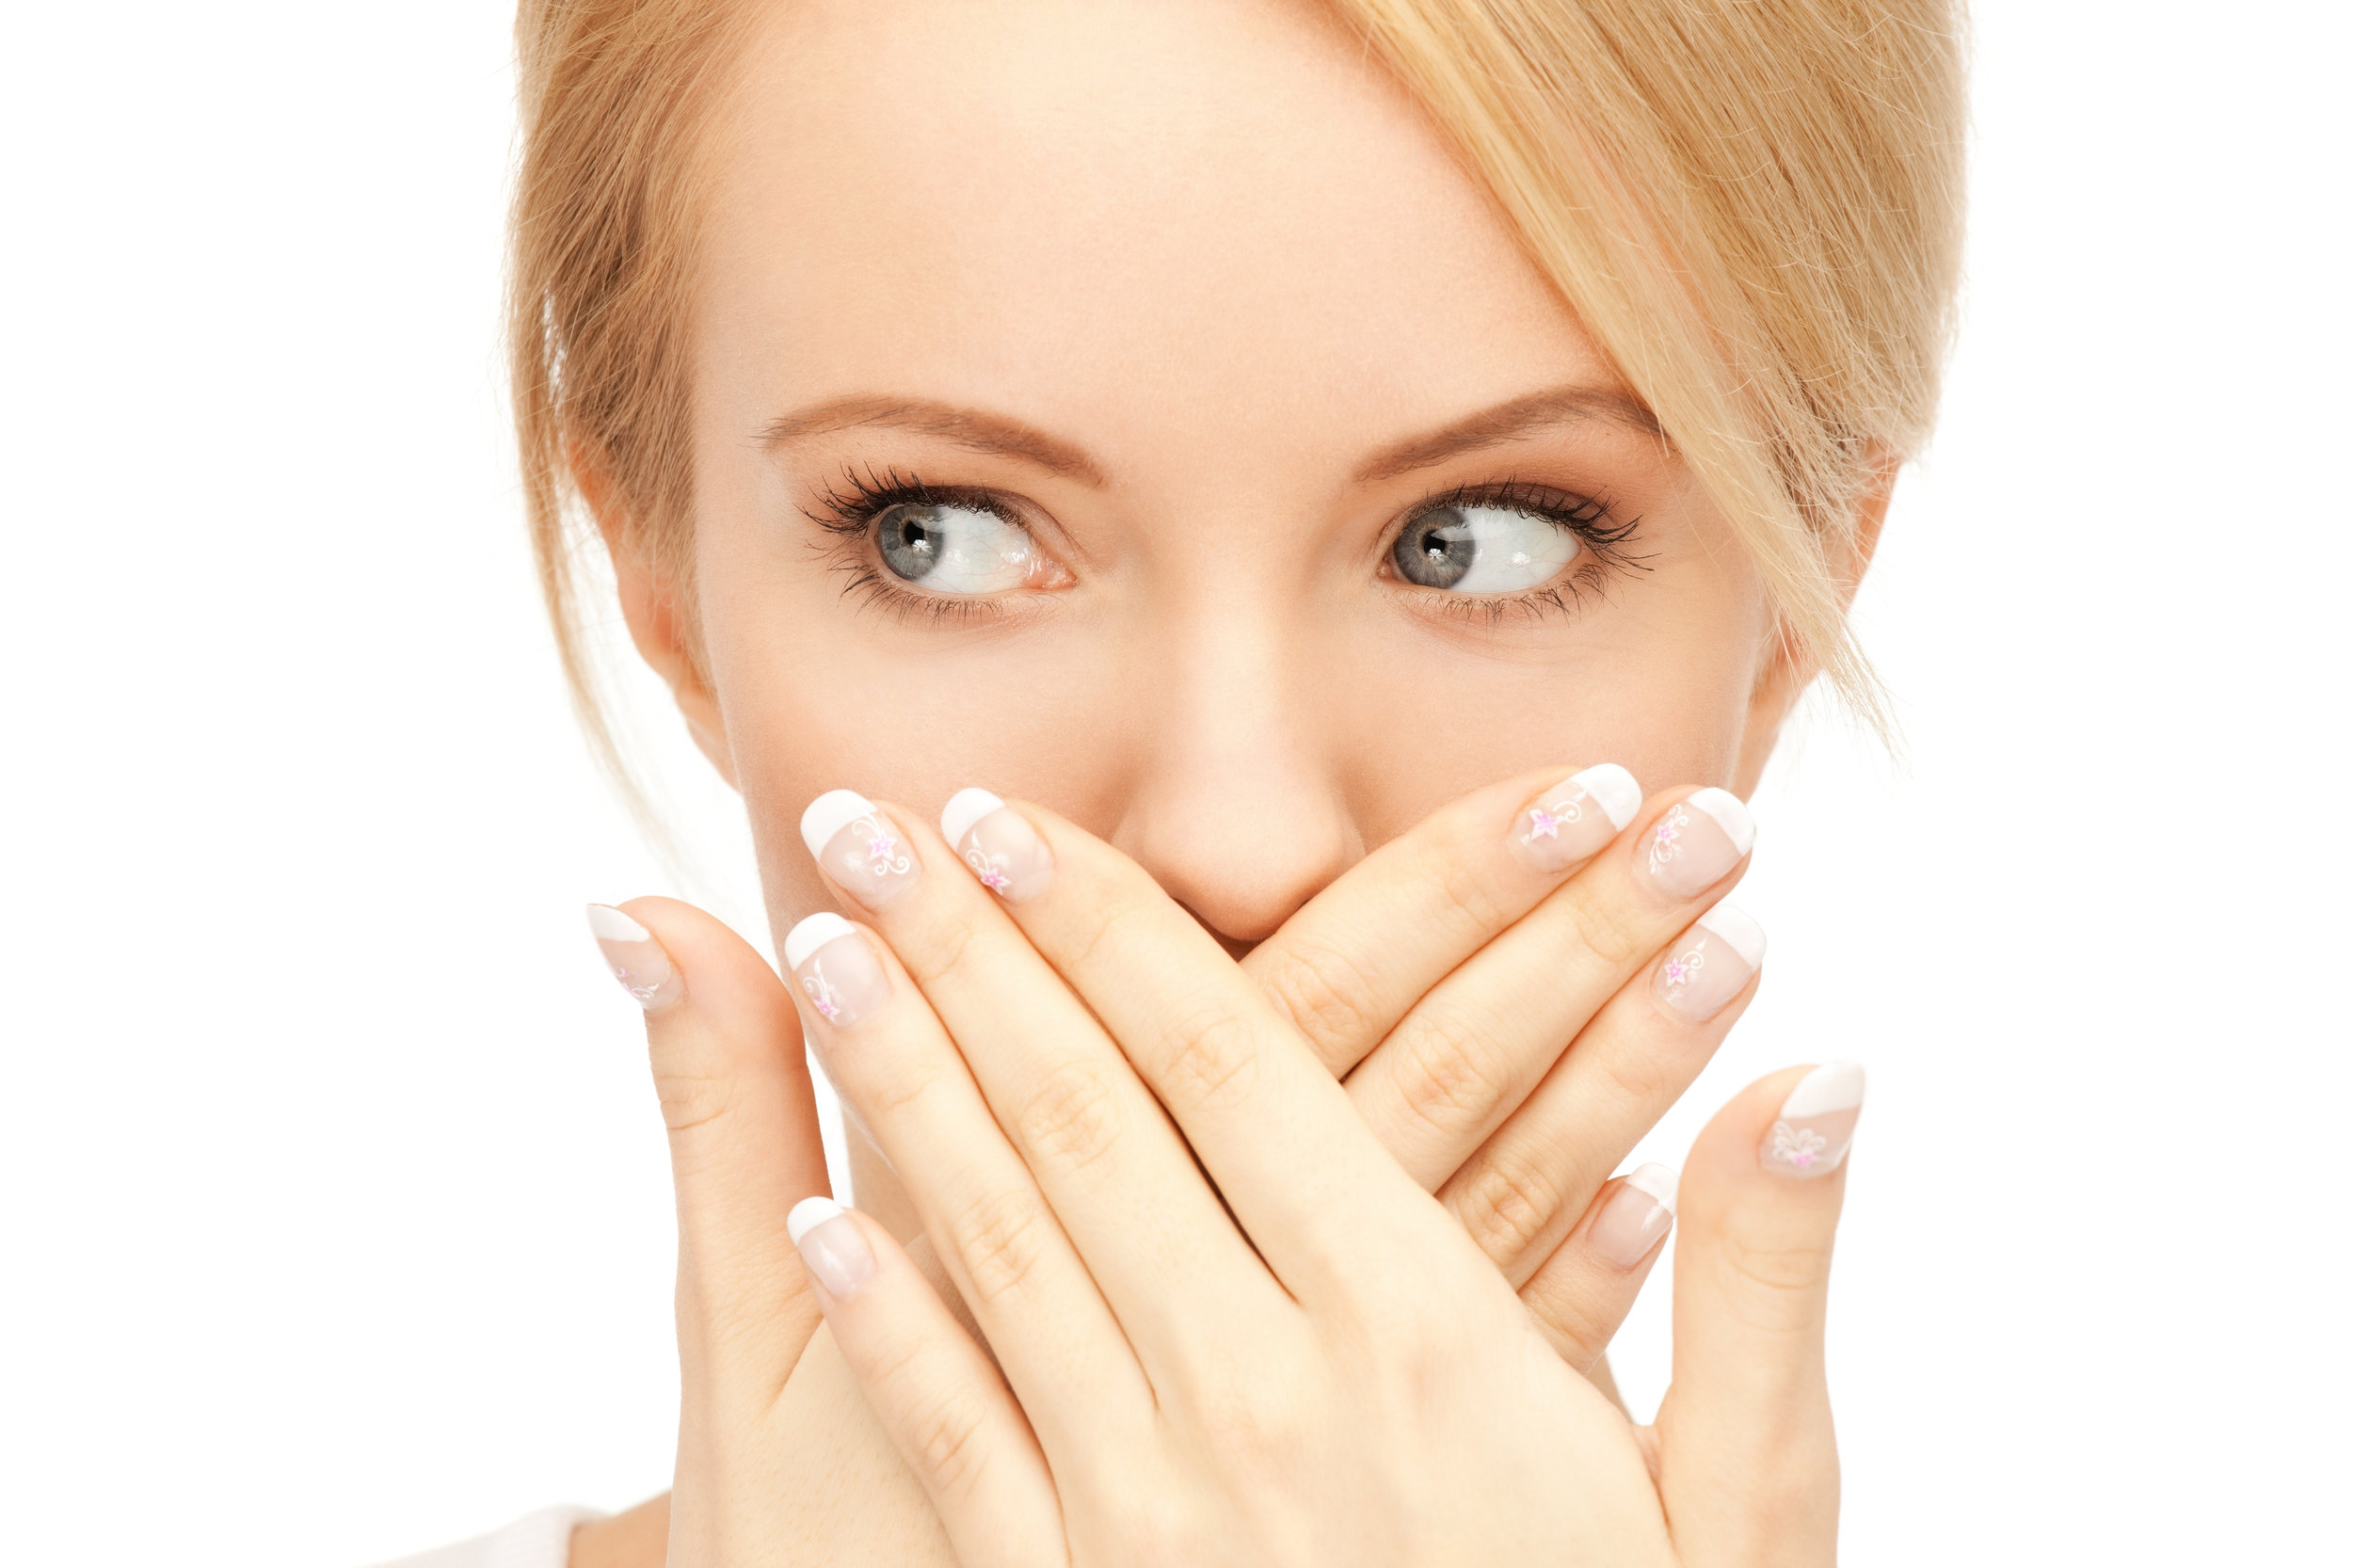 woman secret manicure.jpeg